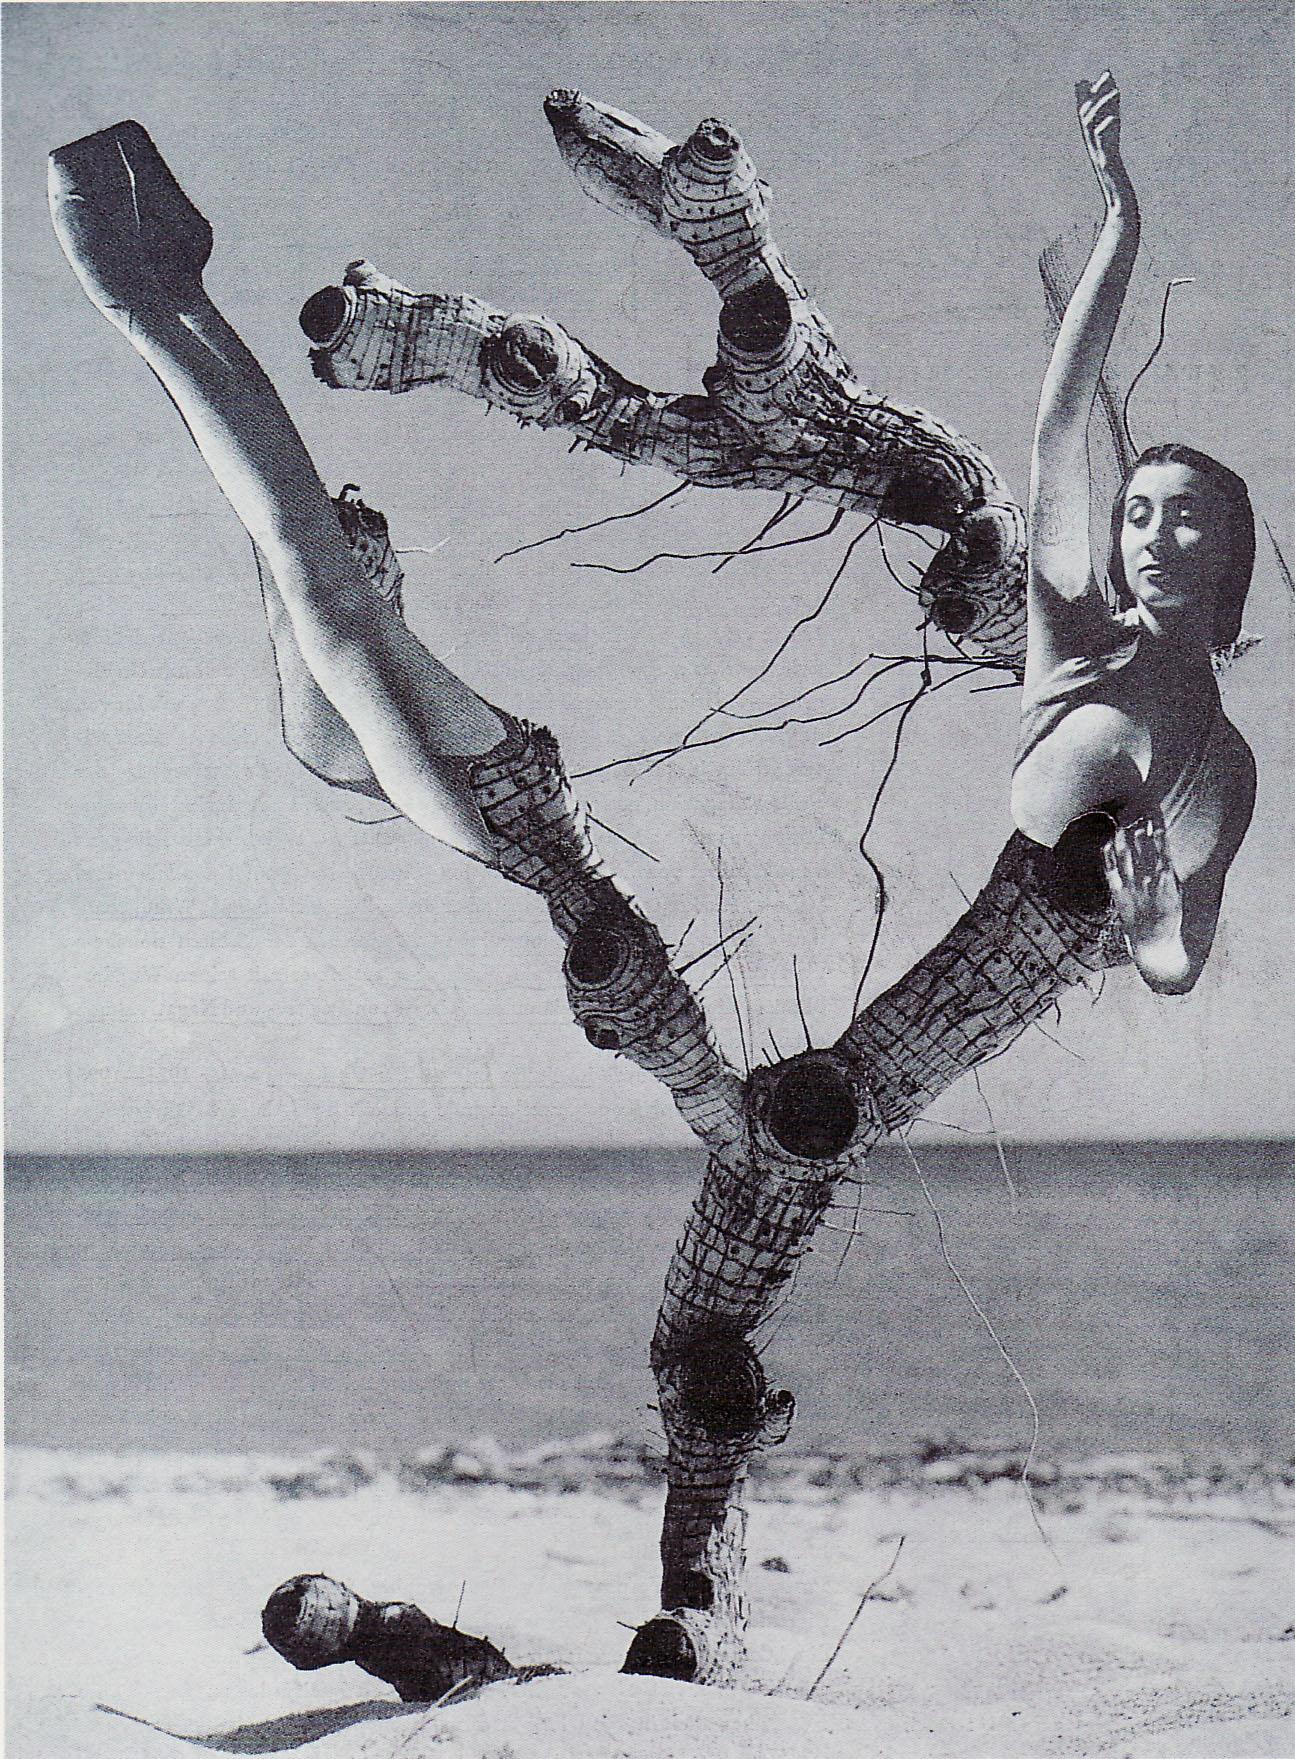 Karel Teige, collage 353, 1948.(c) Nachlass Karel Teige